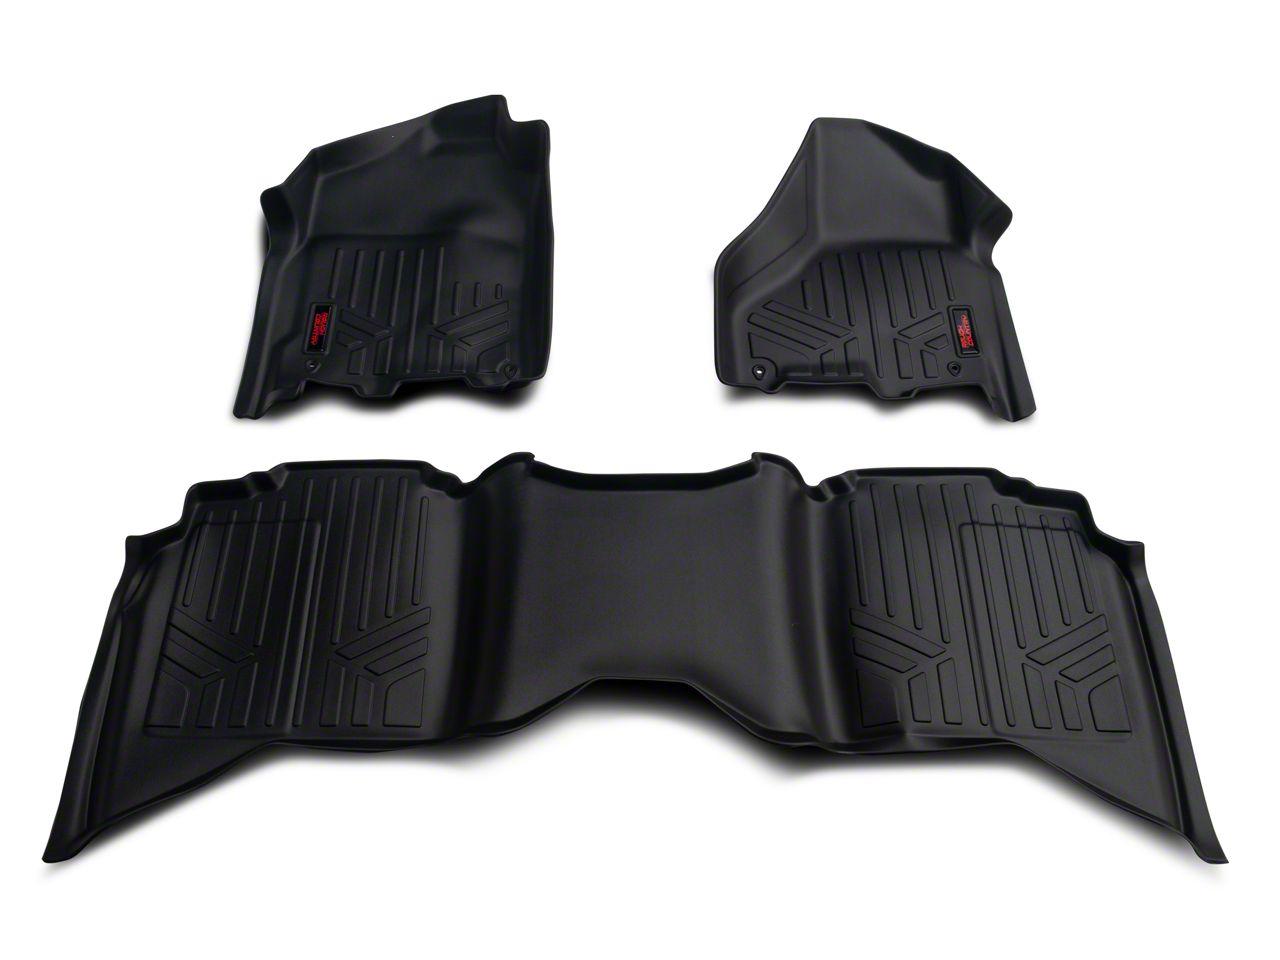 Rough Country Heavy Duty Front & Rear Floor Mats - Black (12-18 RAM 1500 Quad Cab, Crew Cab)